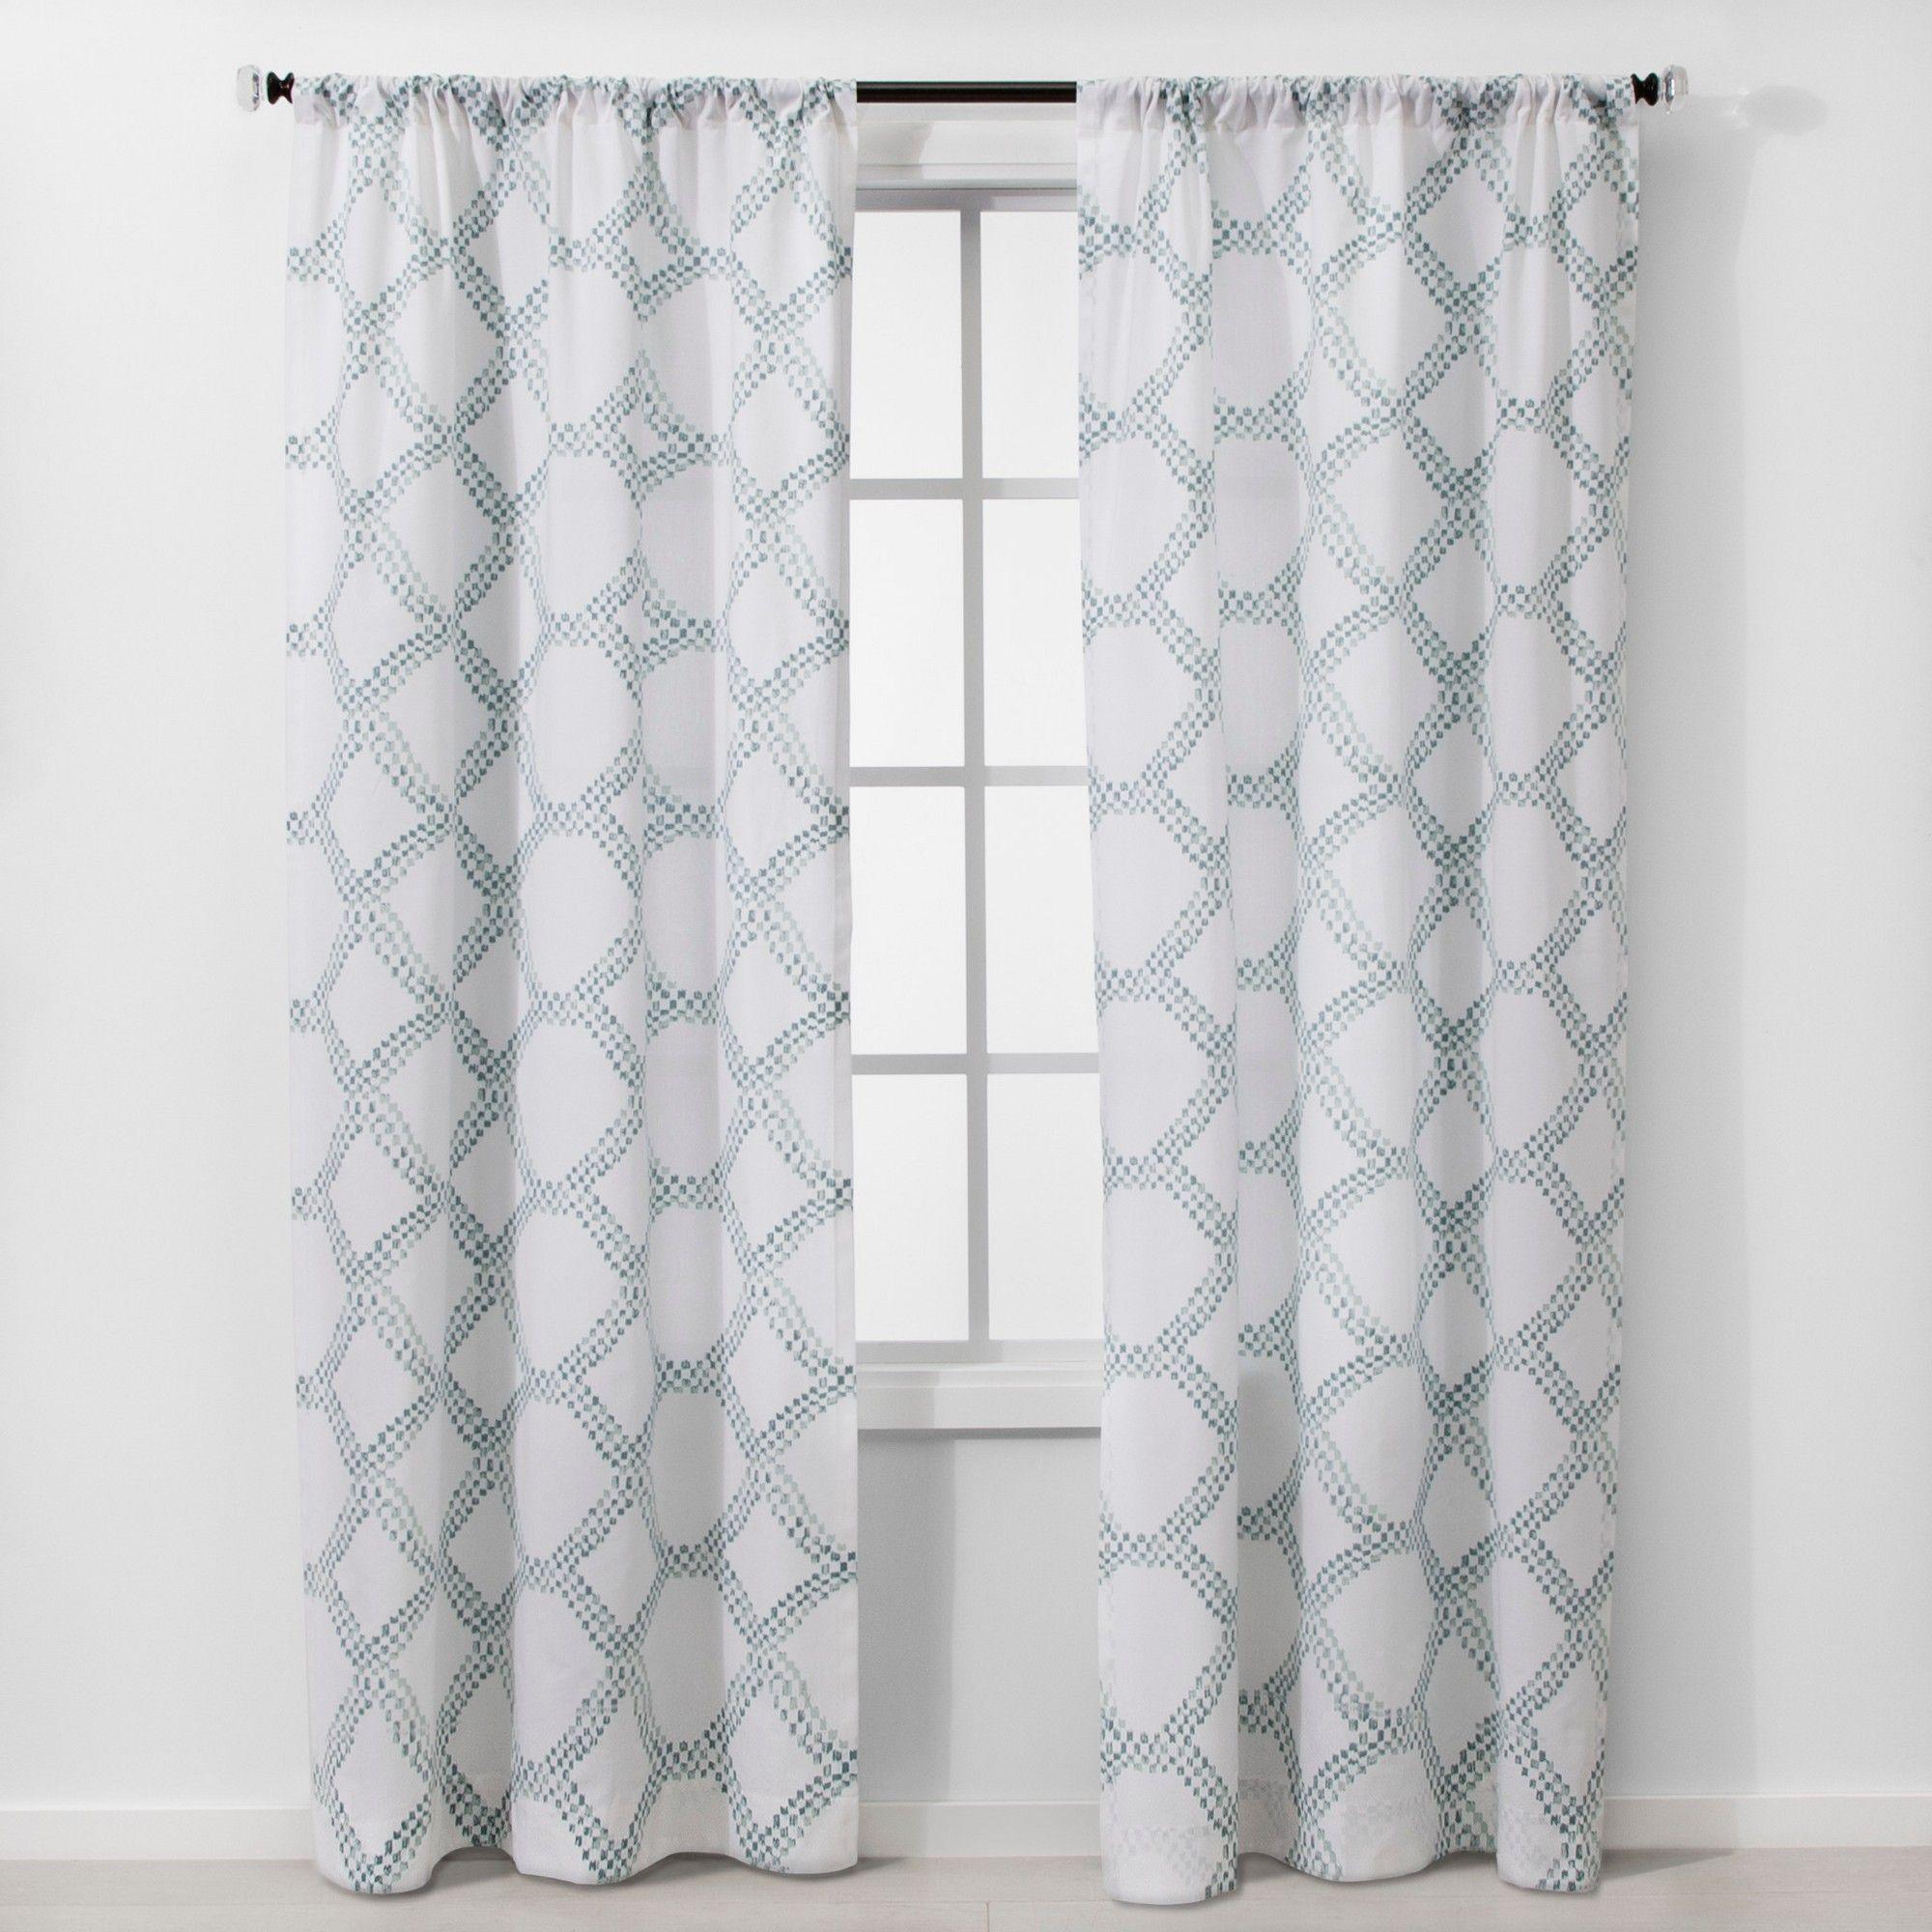 2pc 84 X40 Light Filtering Geometric Window Curtain Panels White